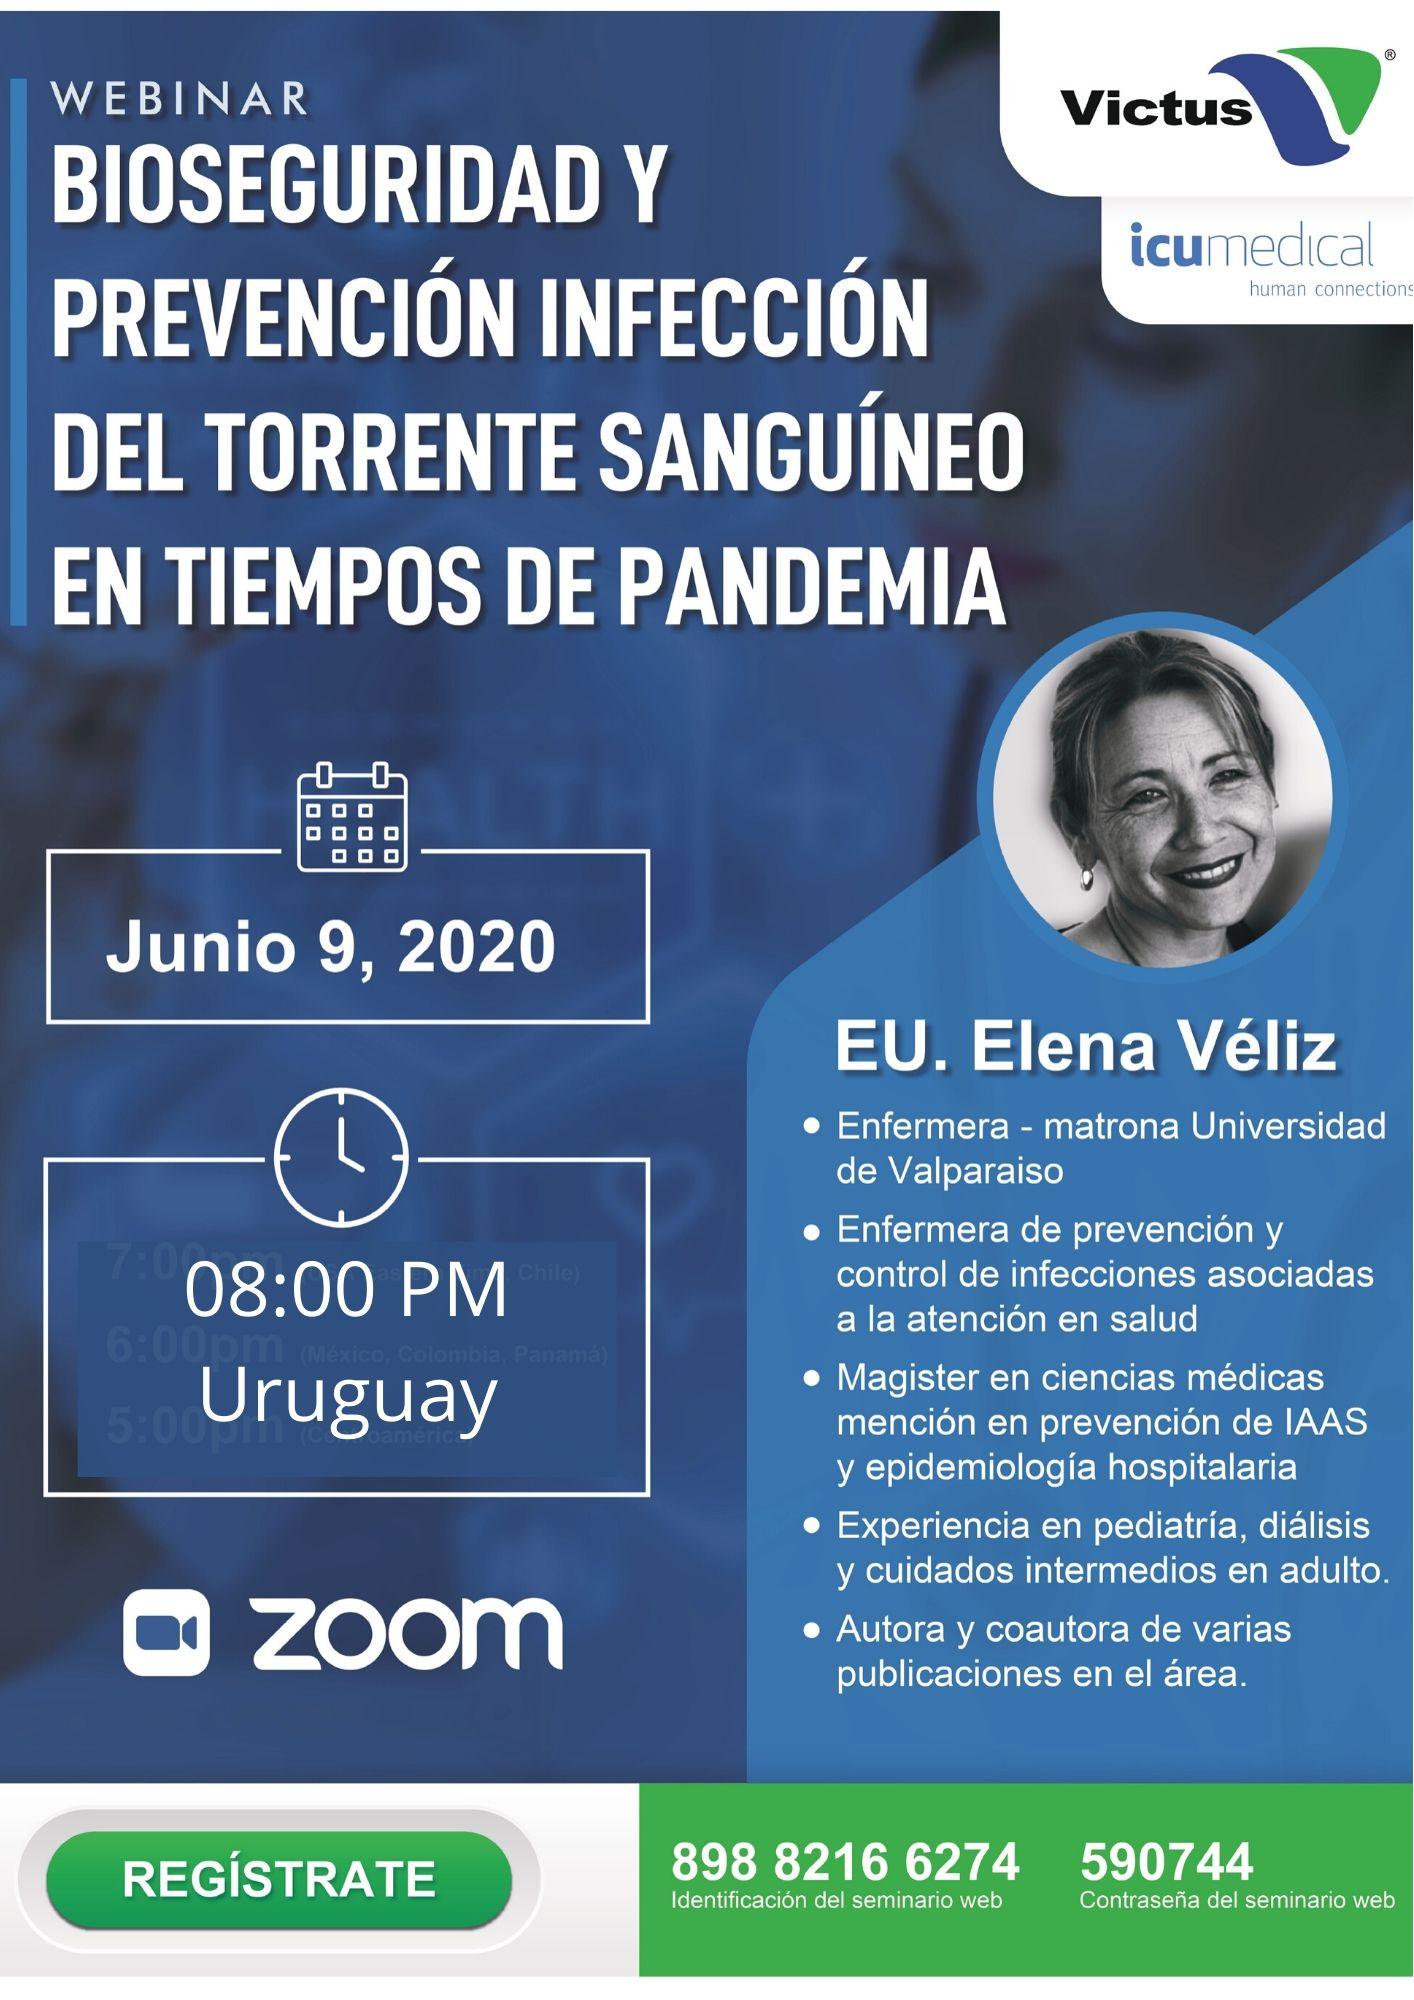 08 00 PM Uruguay